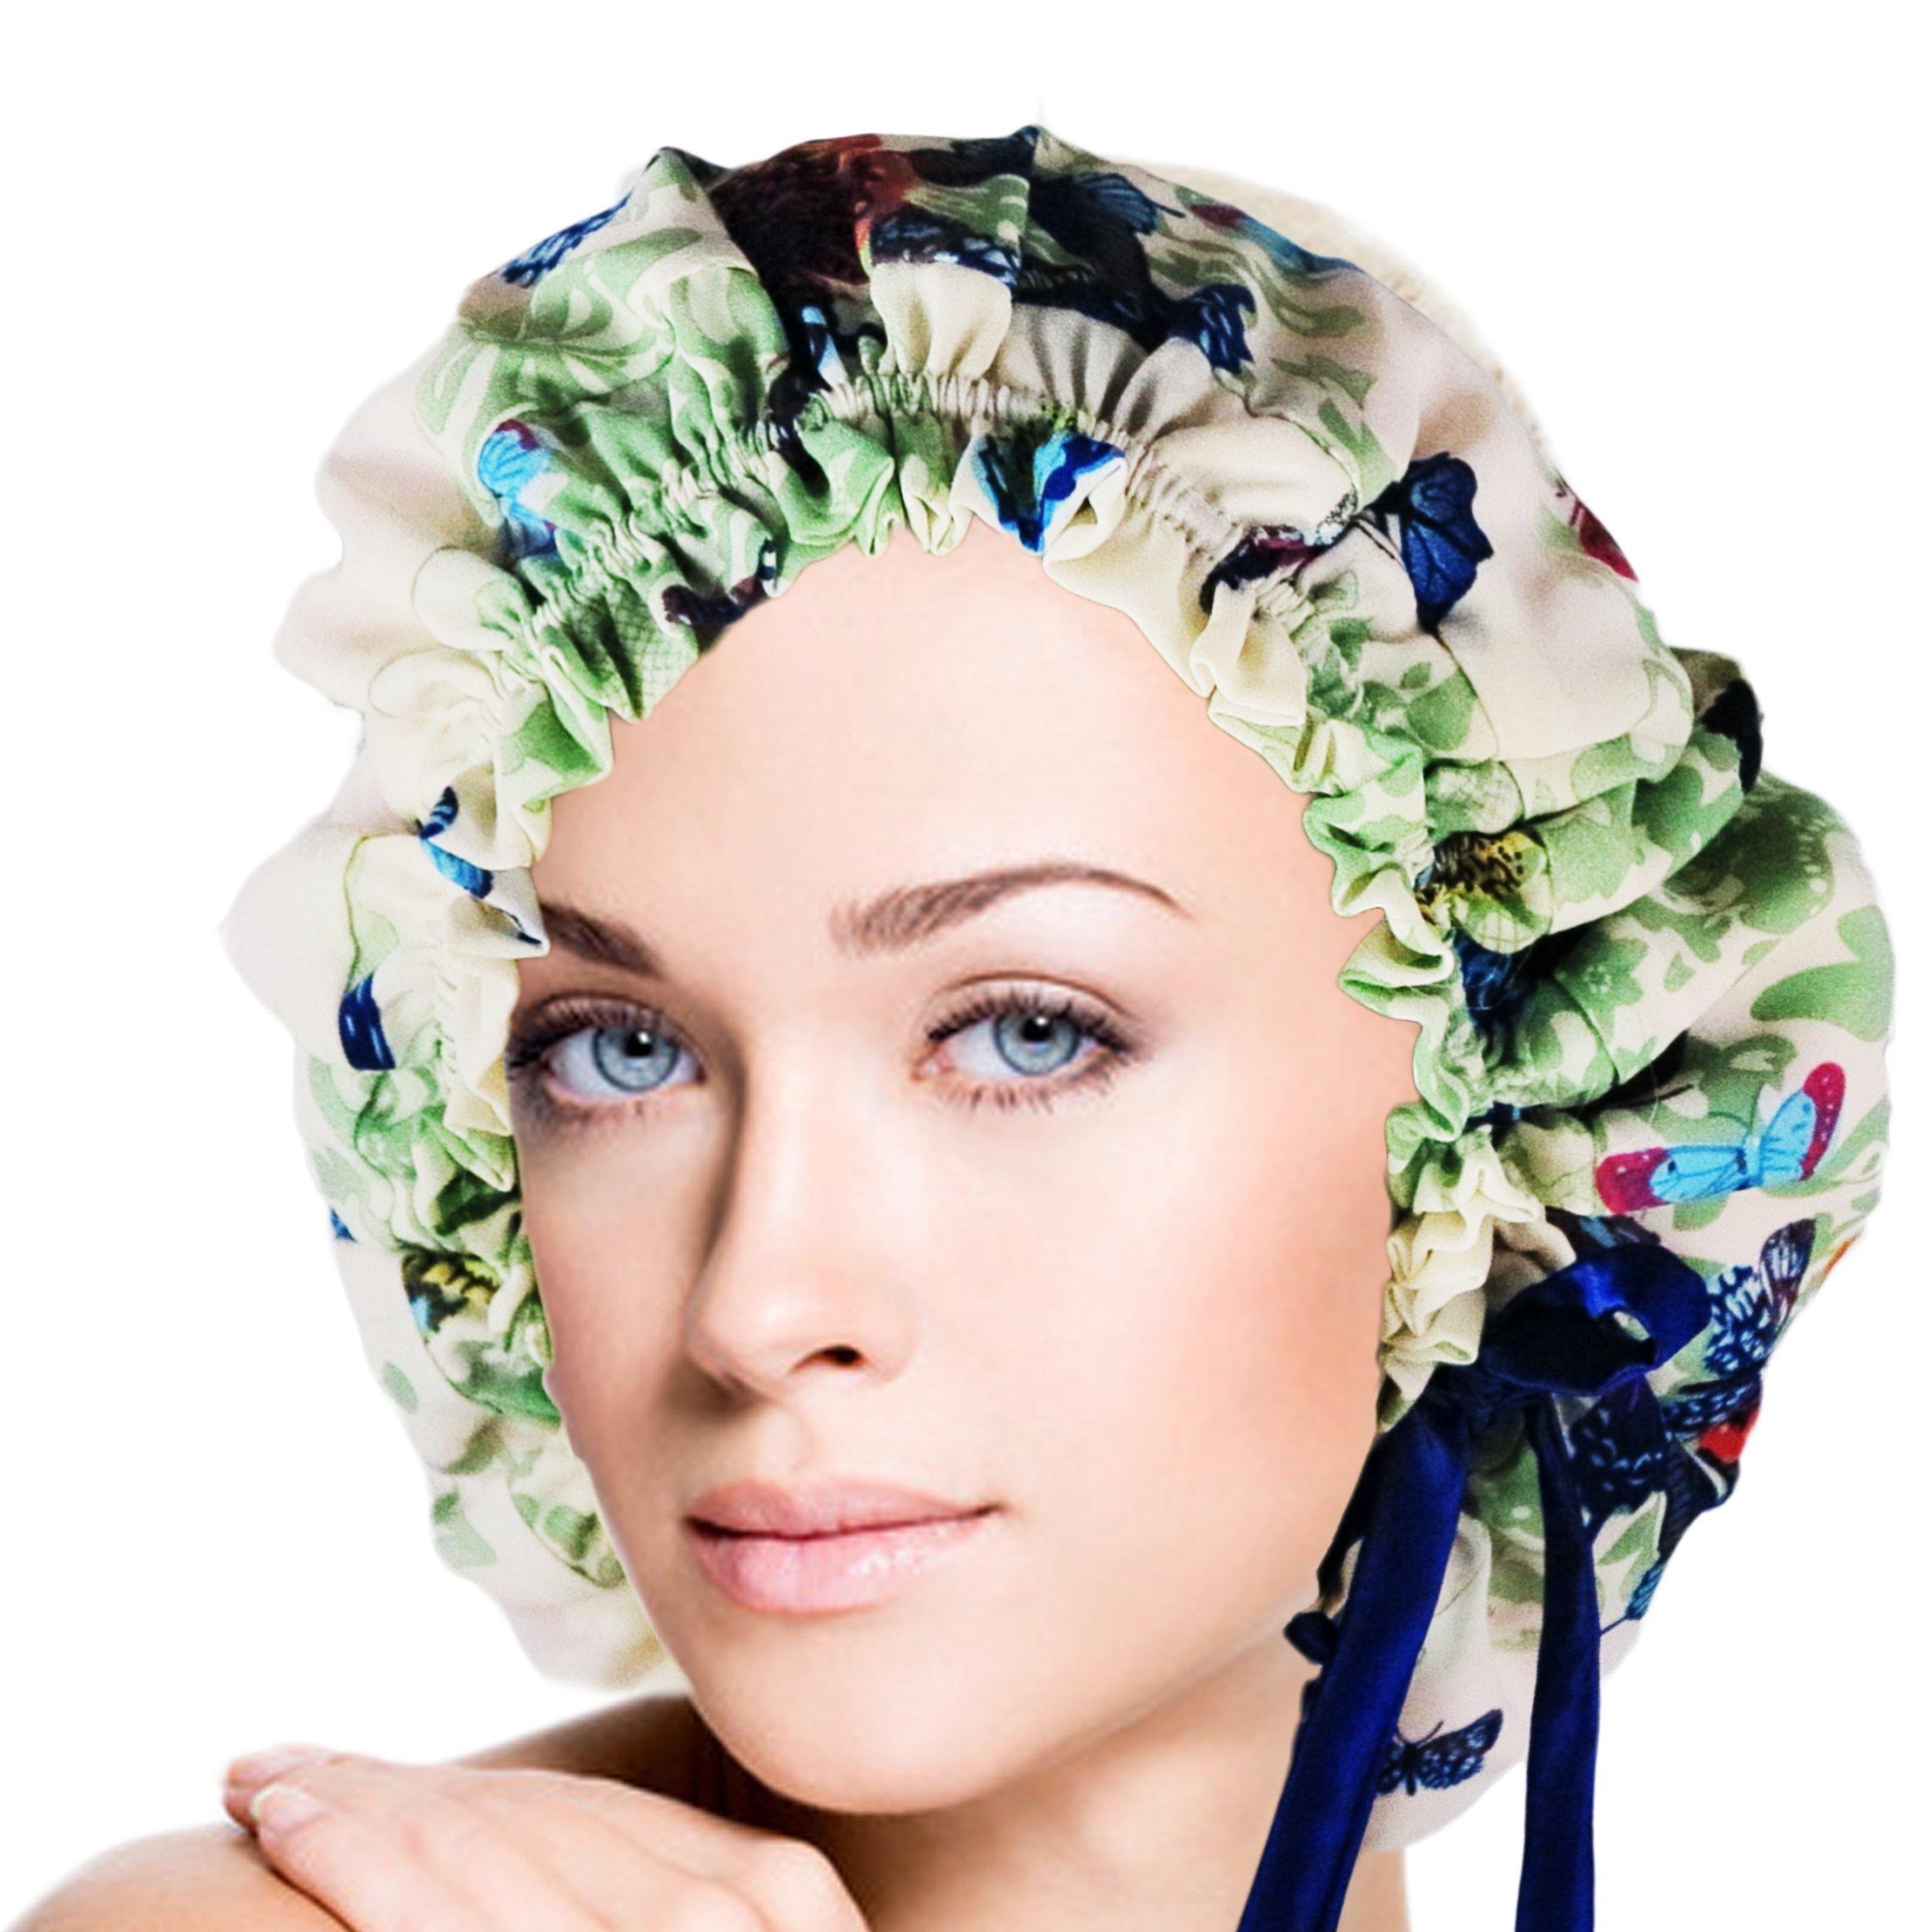 Adjustable Double Layers Butterfly Print Silk Sleep Cap Night Cap Head Cover Bonnet for Hair Beauty Fits head sizes: 20.5''-30'' (52-76cm)